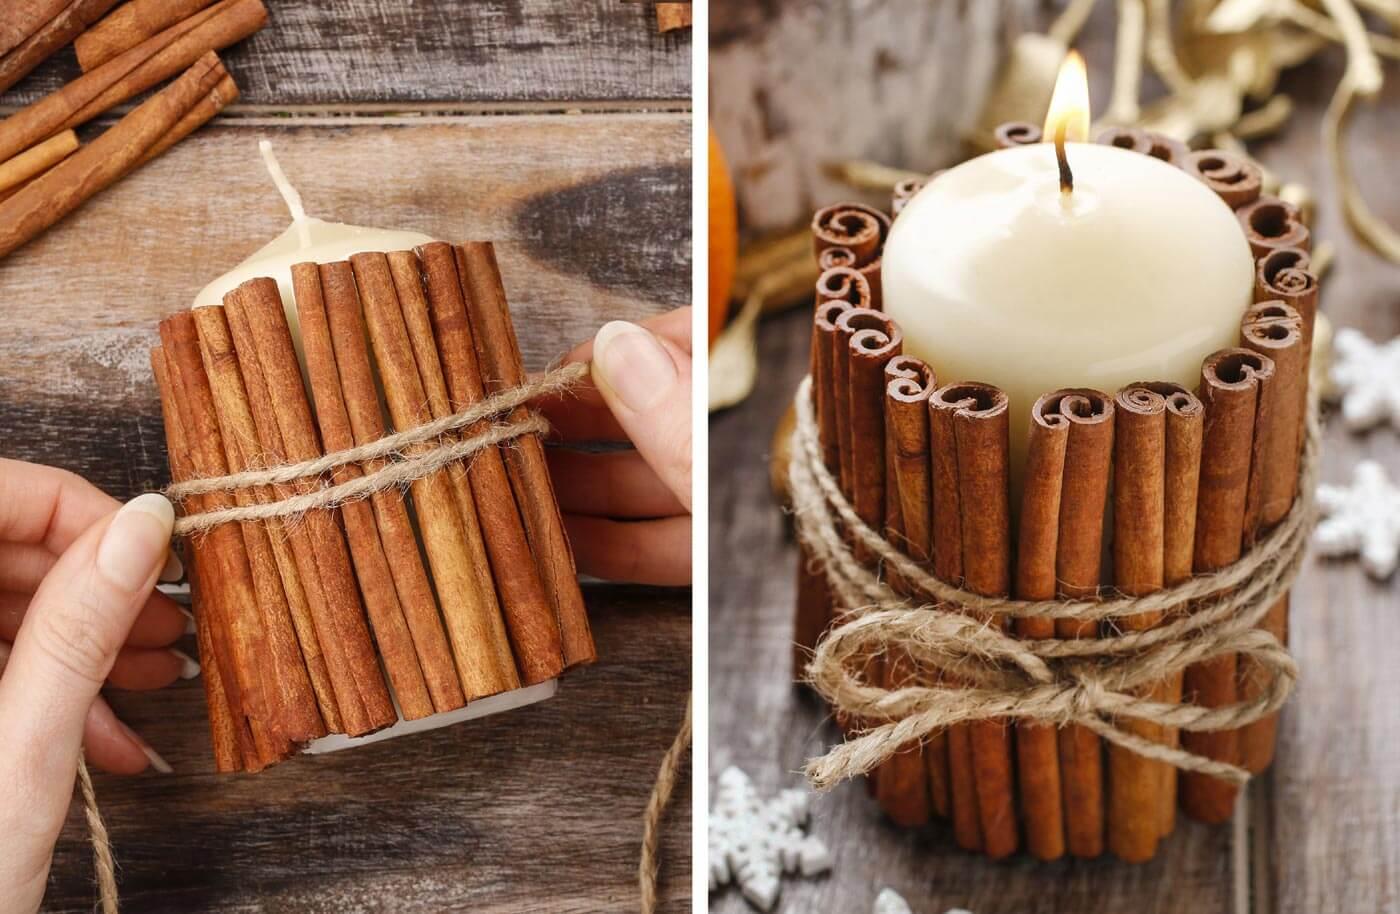 Tischdeko Winterhochzeit Diy Anleitung Kerze Mit Zimtstangen